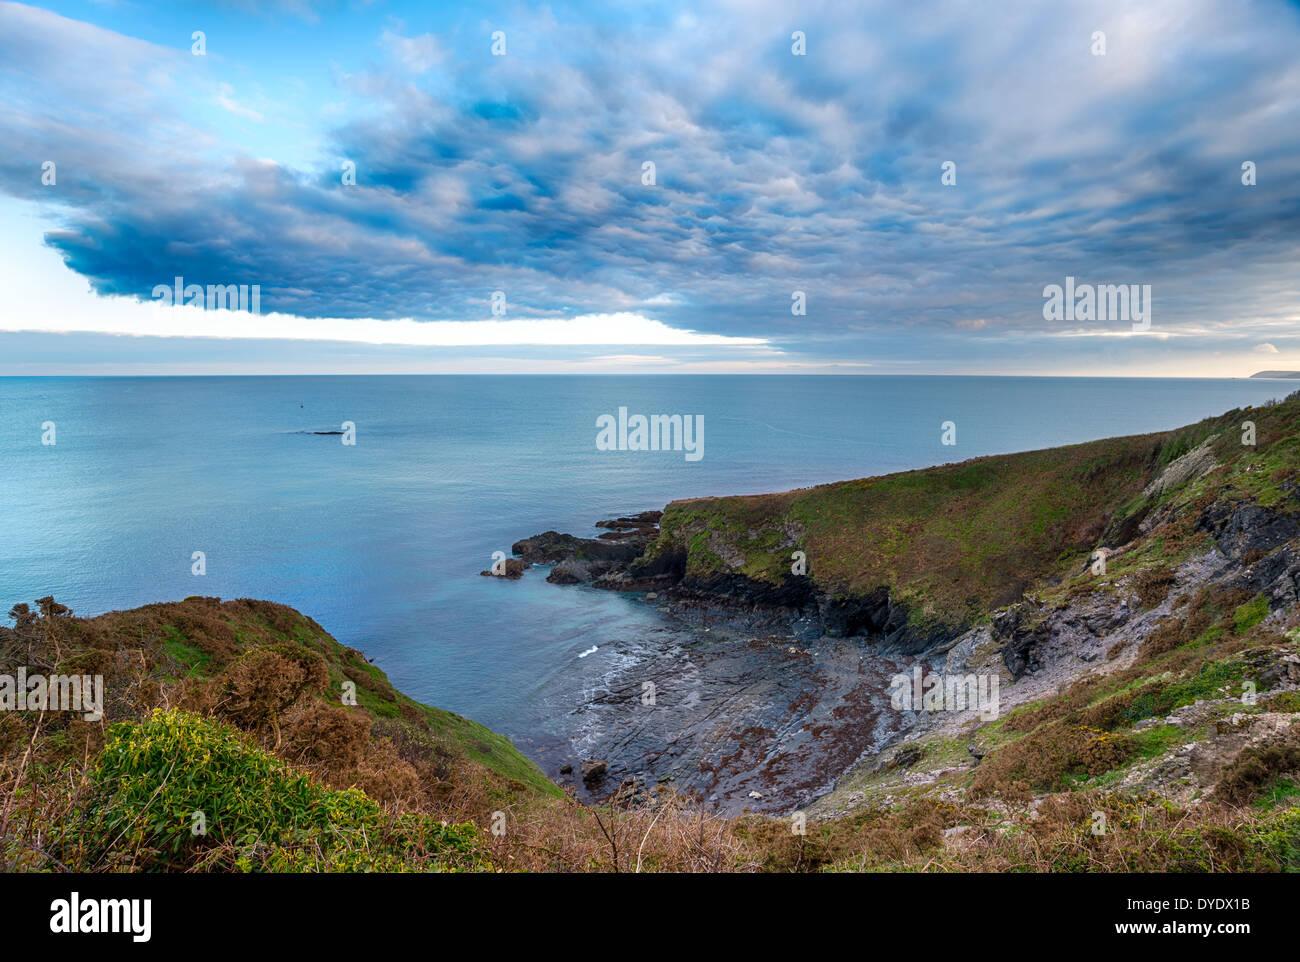 Las nubes se reúnen en cabeza Gribbin cerca de St Austell, en Cornwall. Imagen De Stock